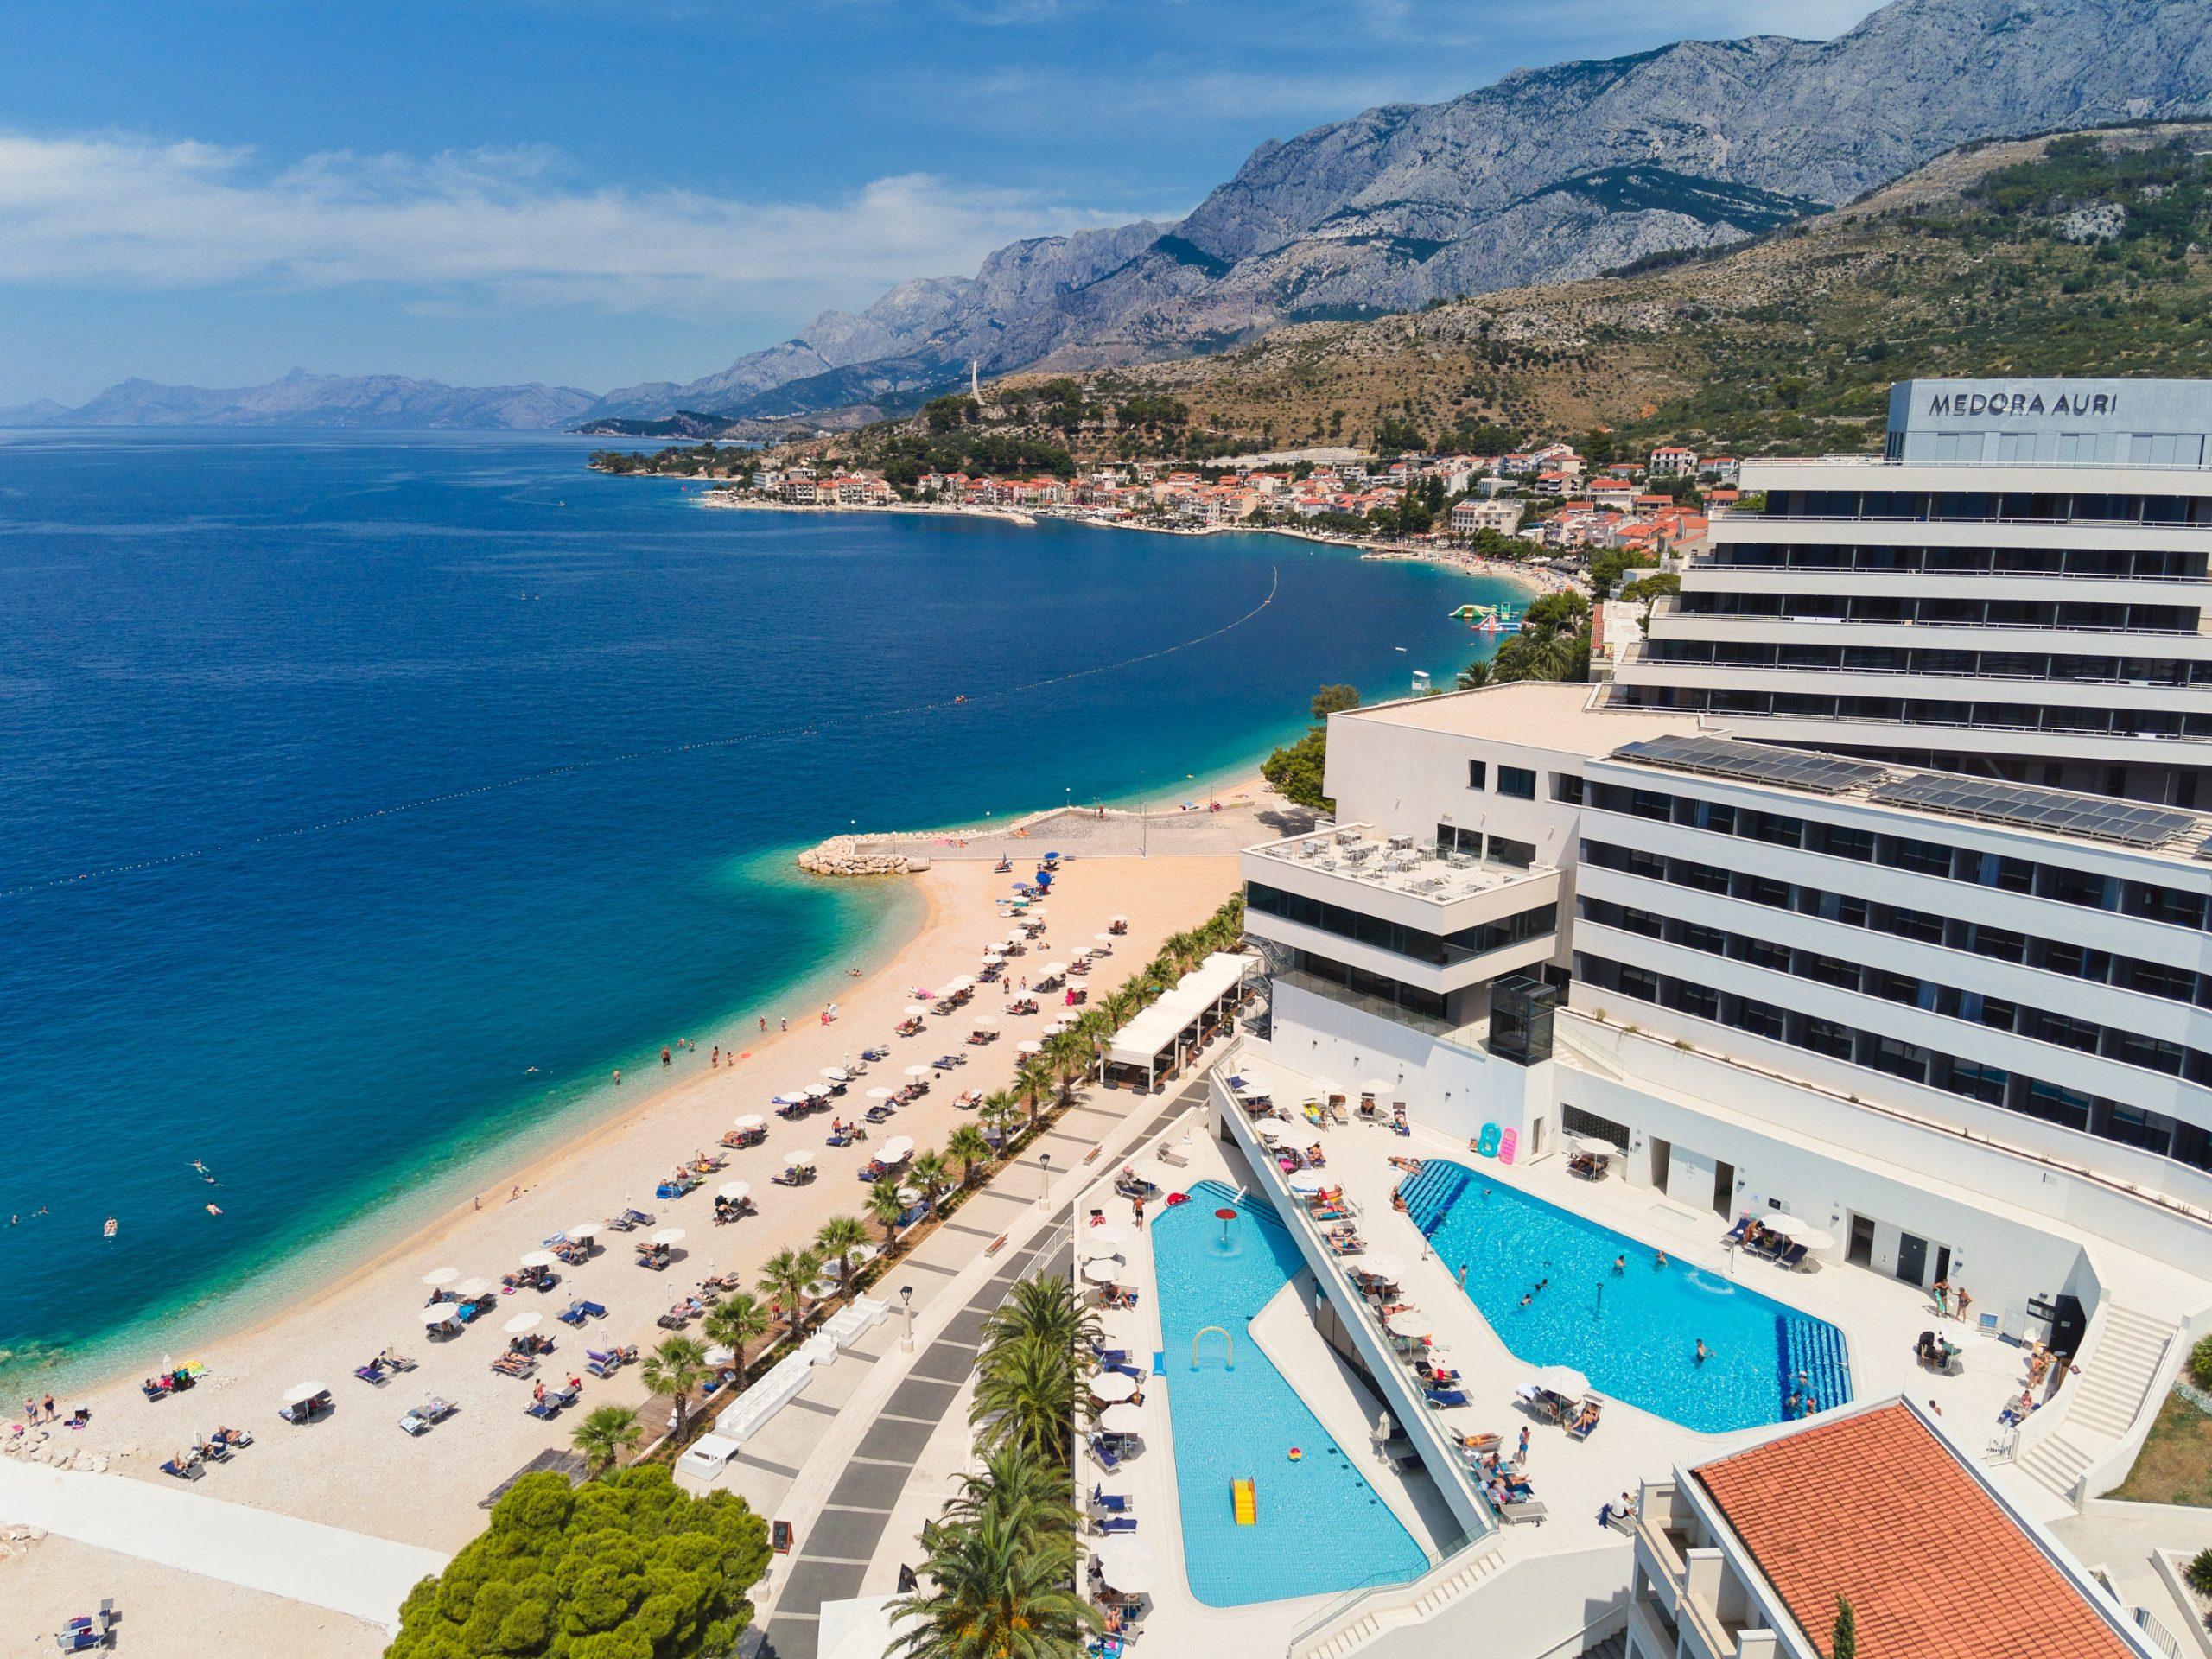 Medora Auri hotel & Podgora dron (1)